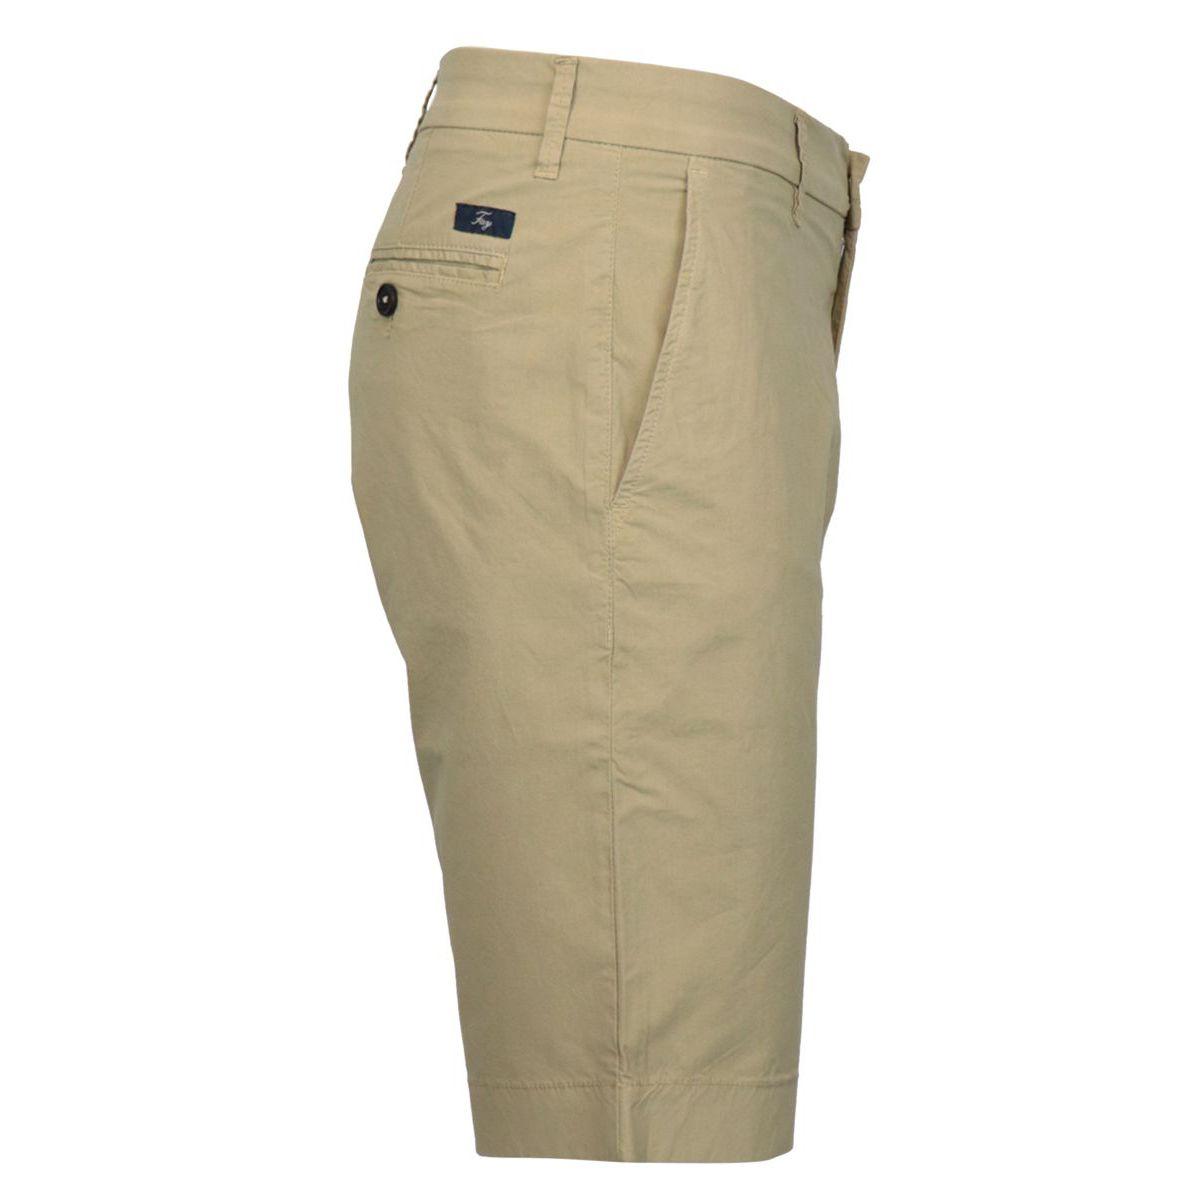 Garment-dyed cotton CHINO shorts Kaki Fay